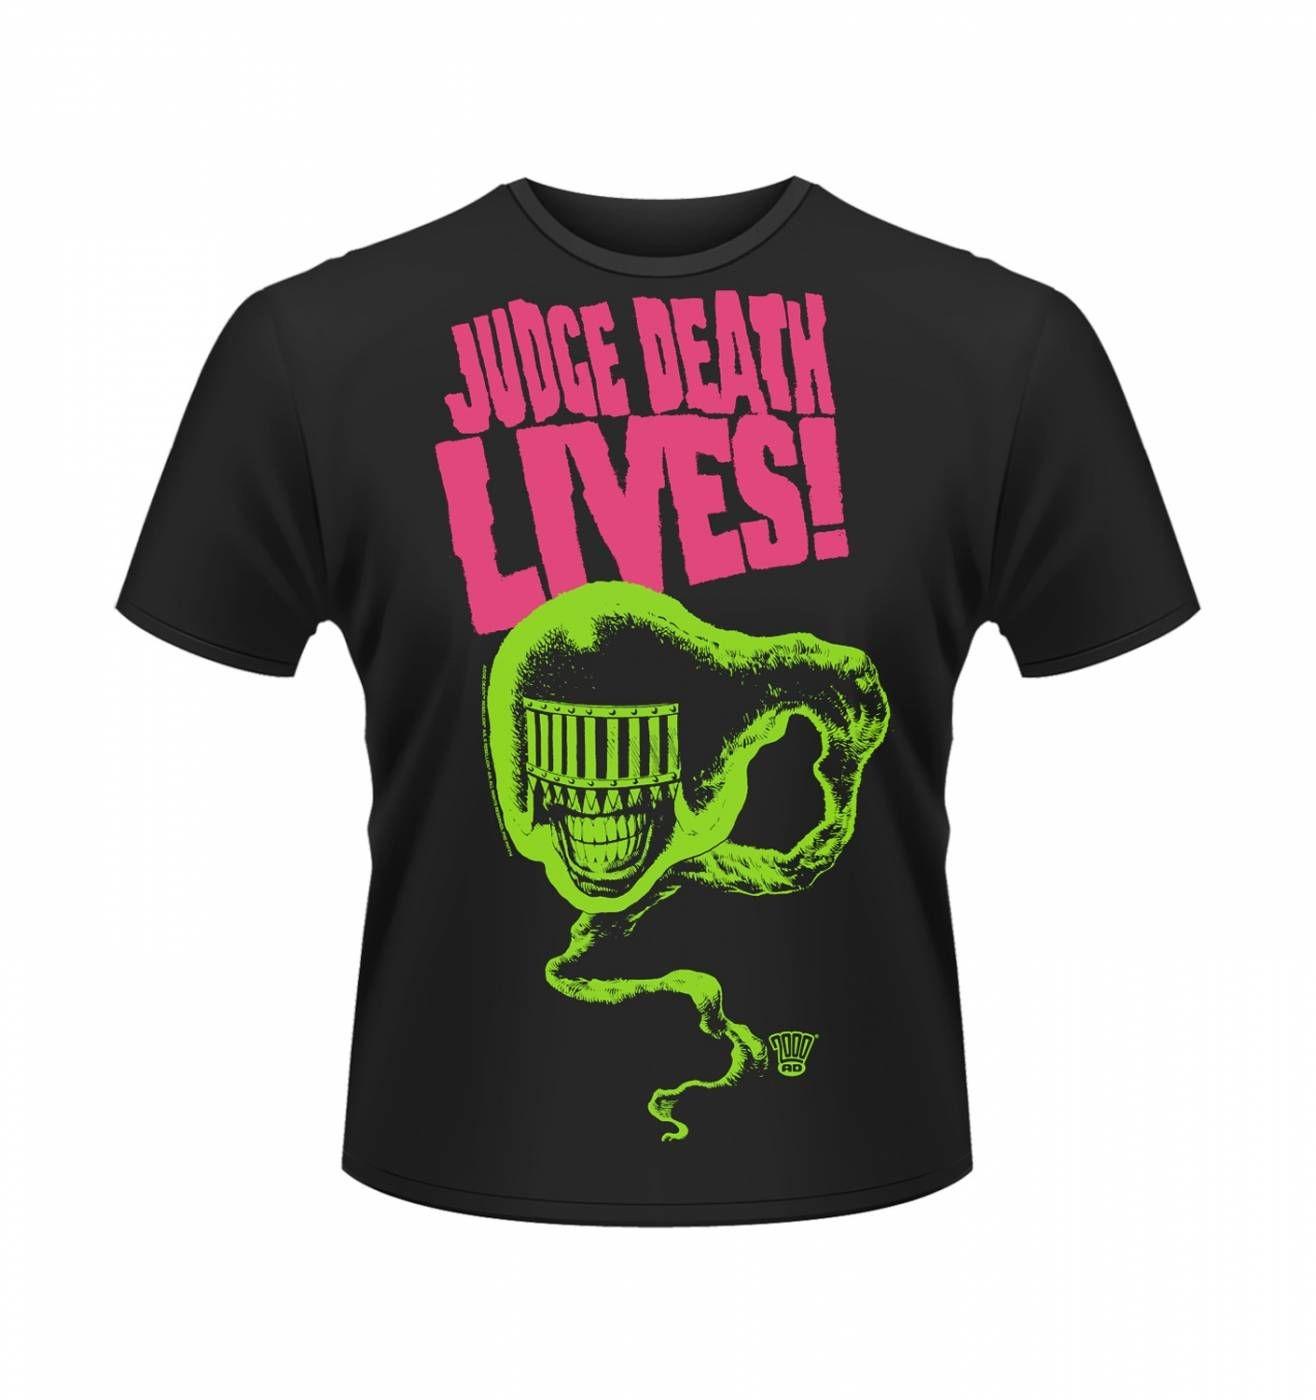 OFFICIAL 2000AD Judge Death Lives! t-shirt